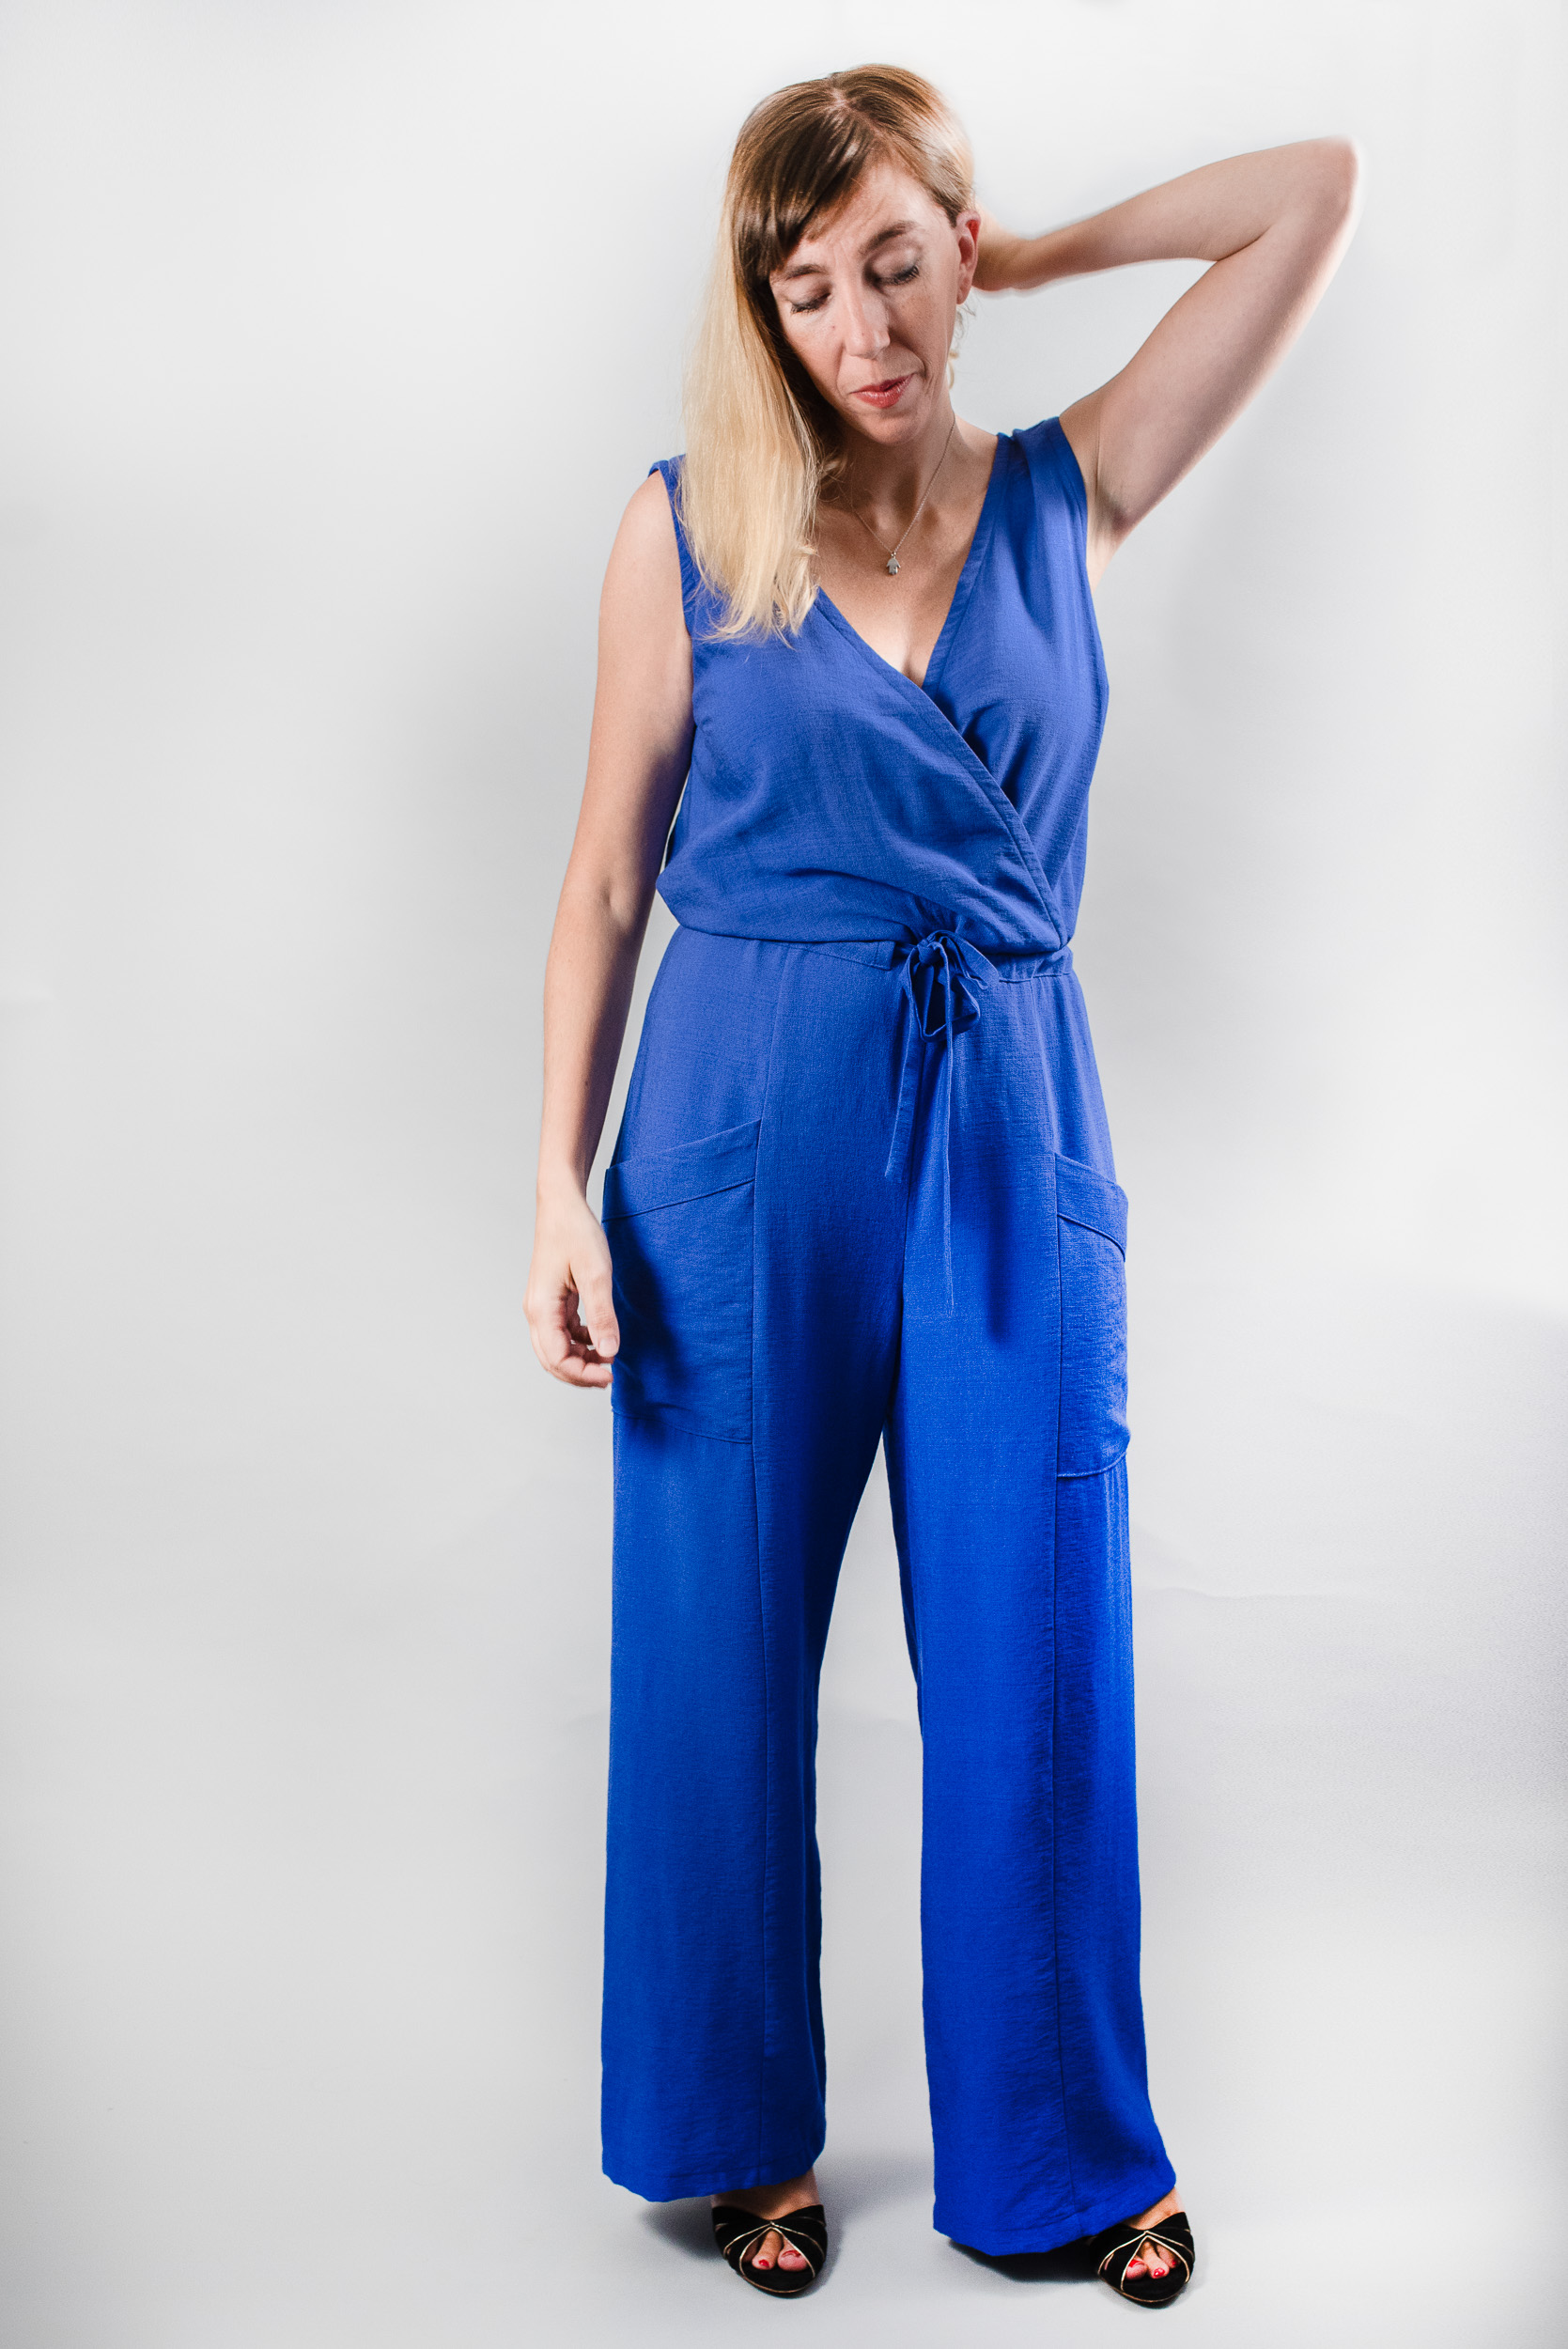 Parasol-wrap-jumpsuit-trousers-pdf-sewing-pattern01.jpg